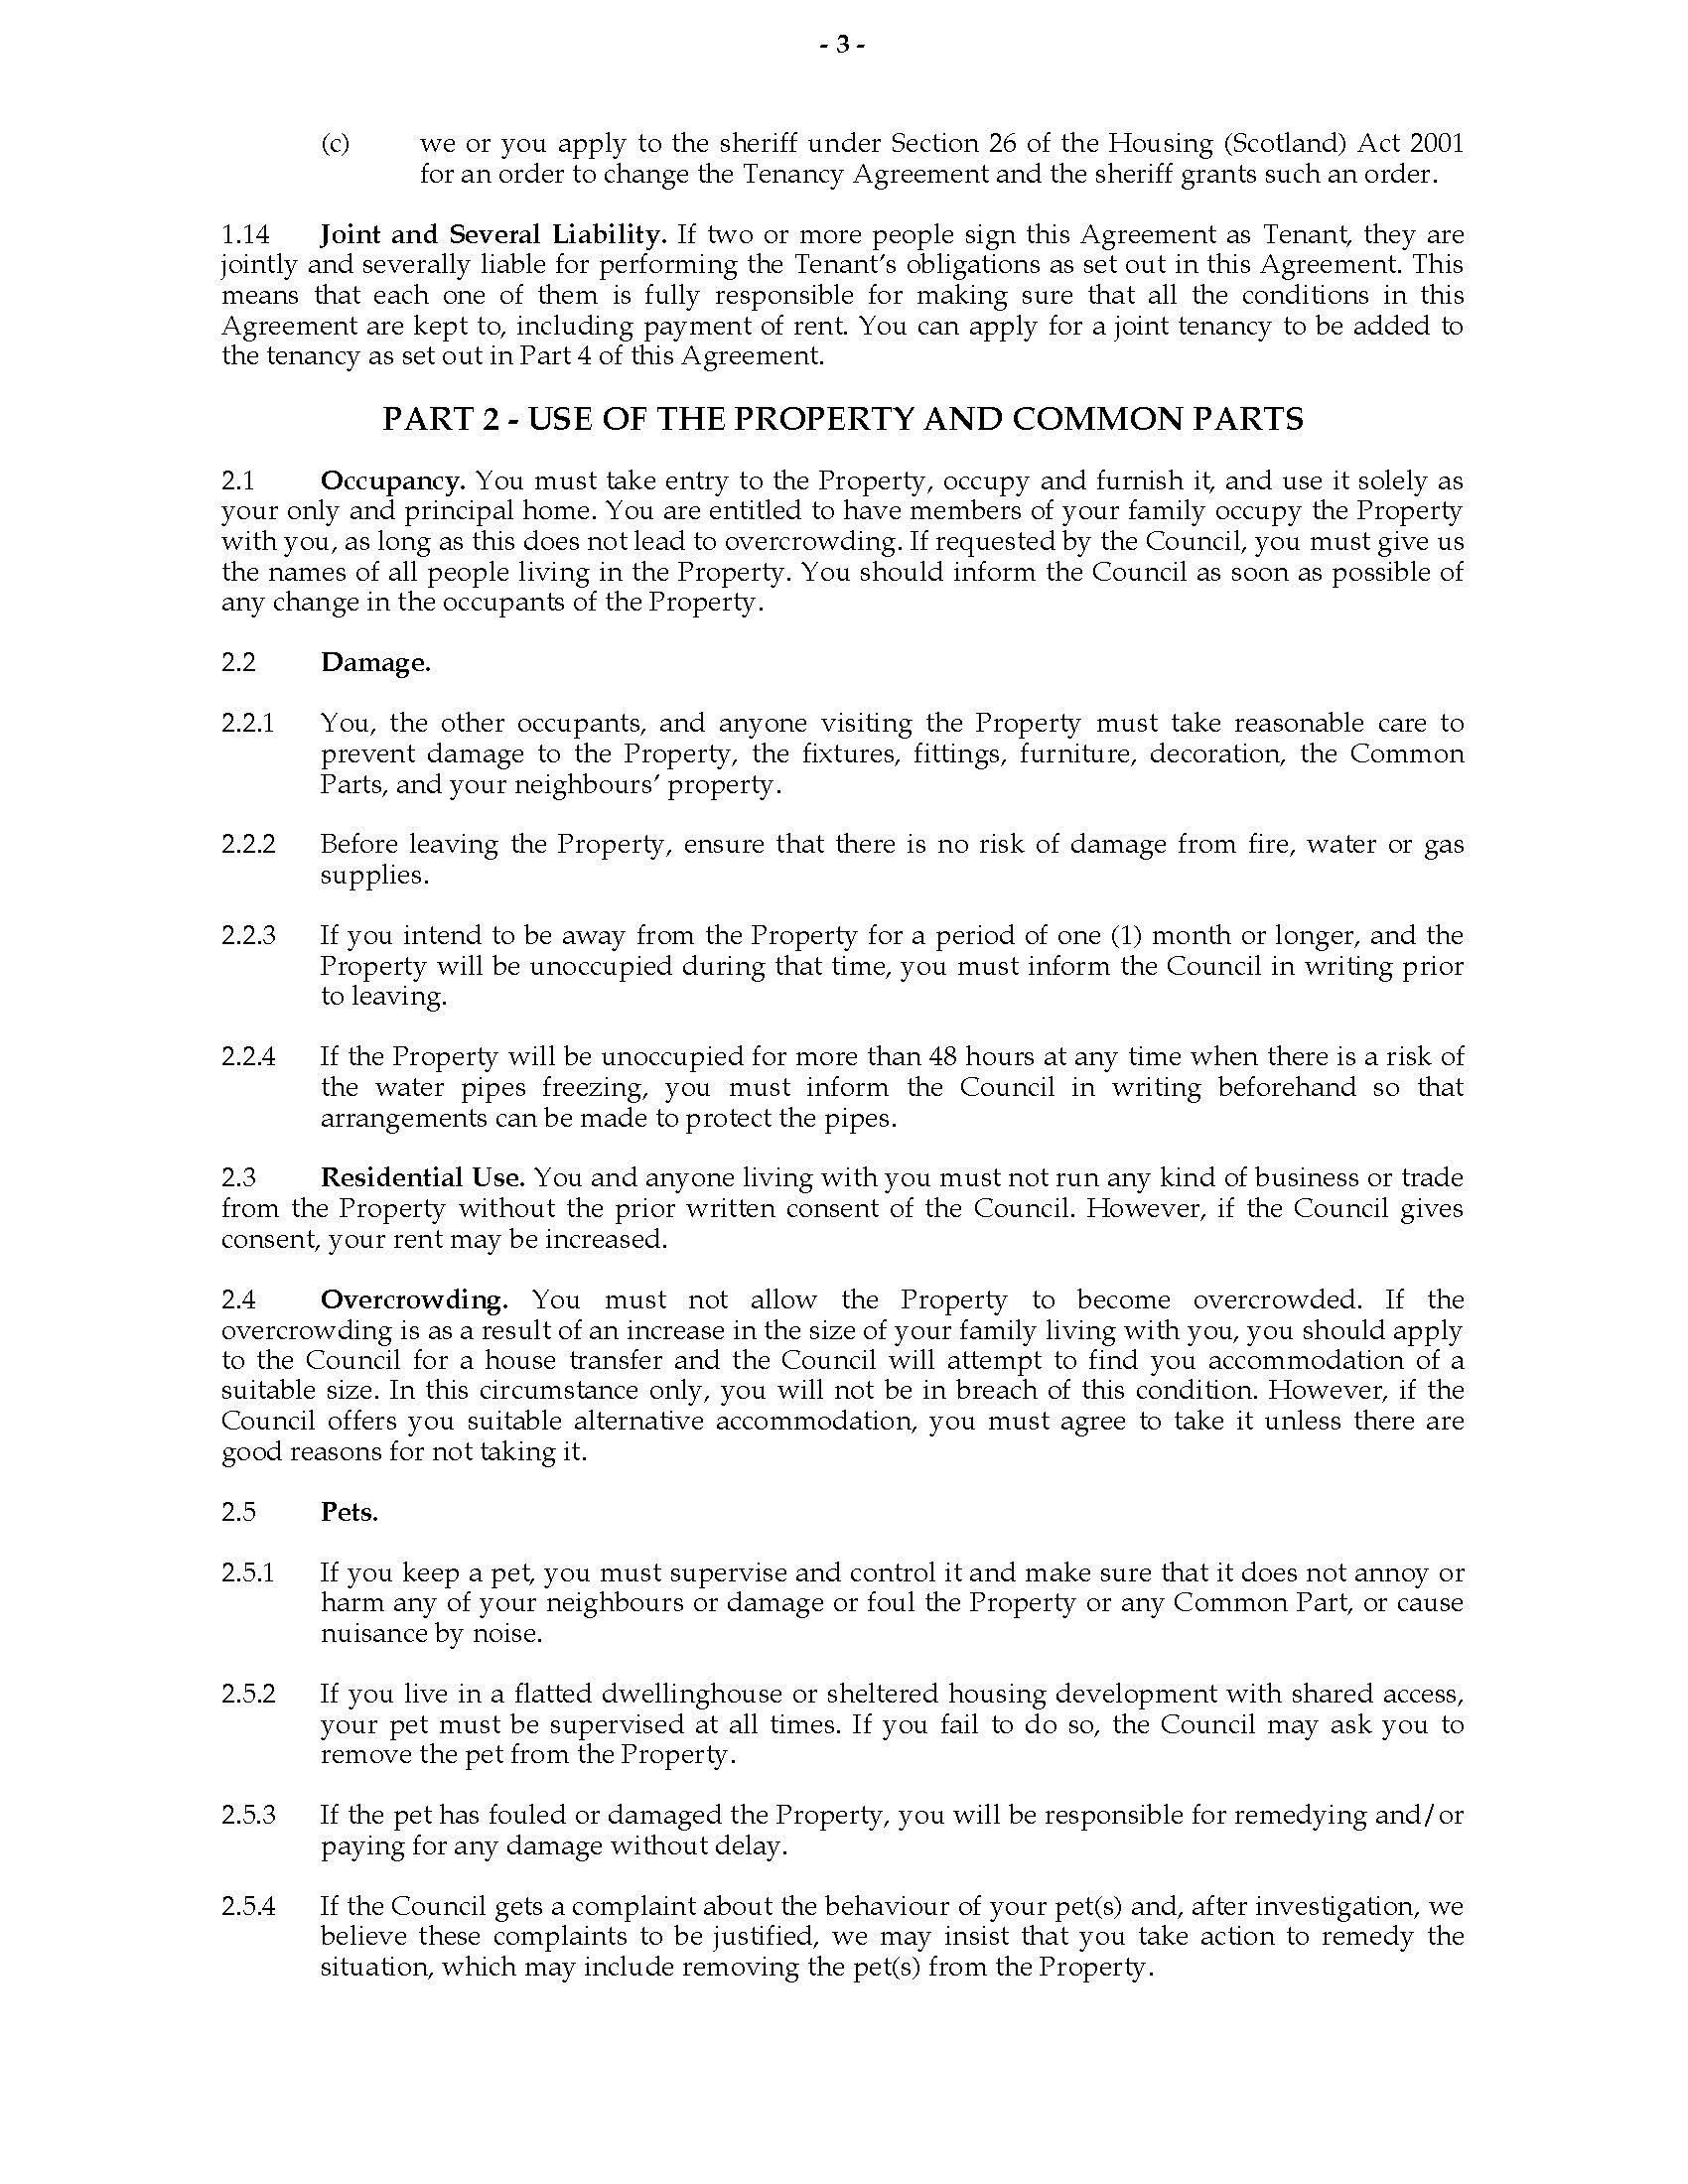 Scotland Short Scottish Secure Tenancy Agreement  Legal Forms And For Scottish Secure Tenancy Agreement Template